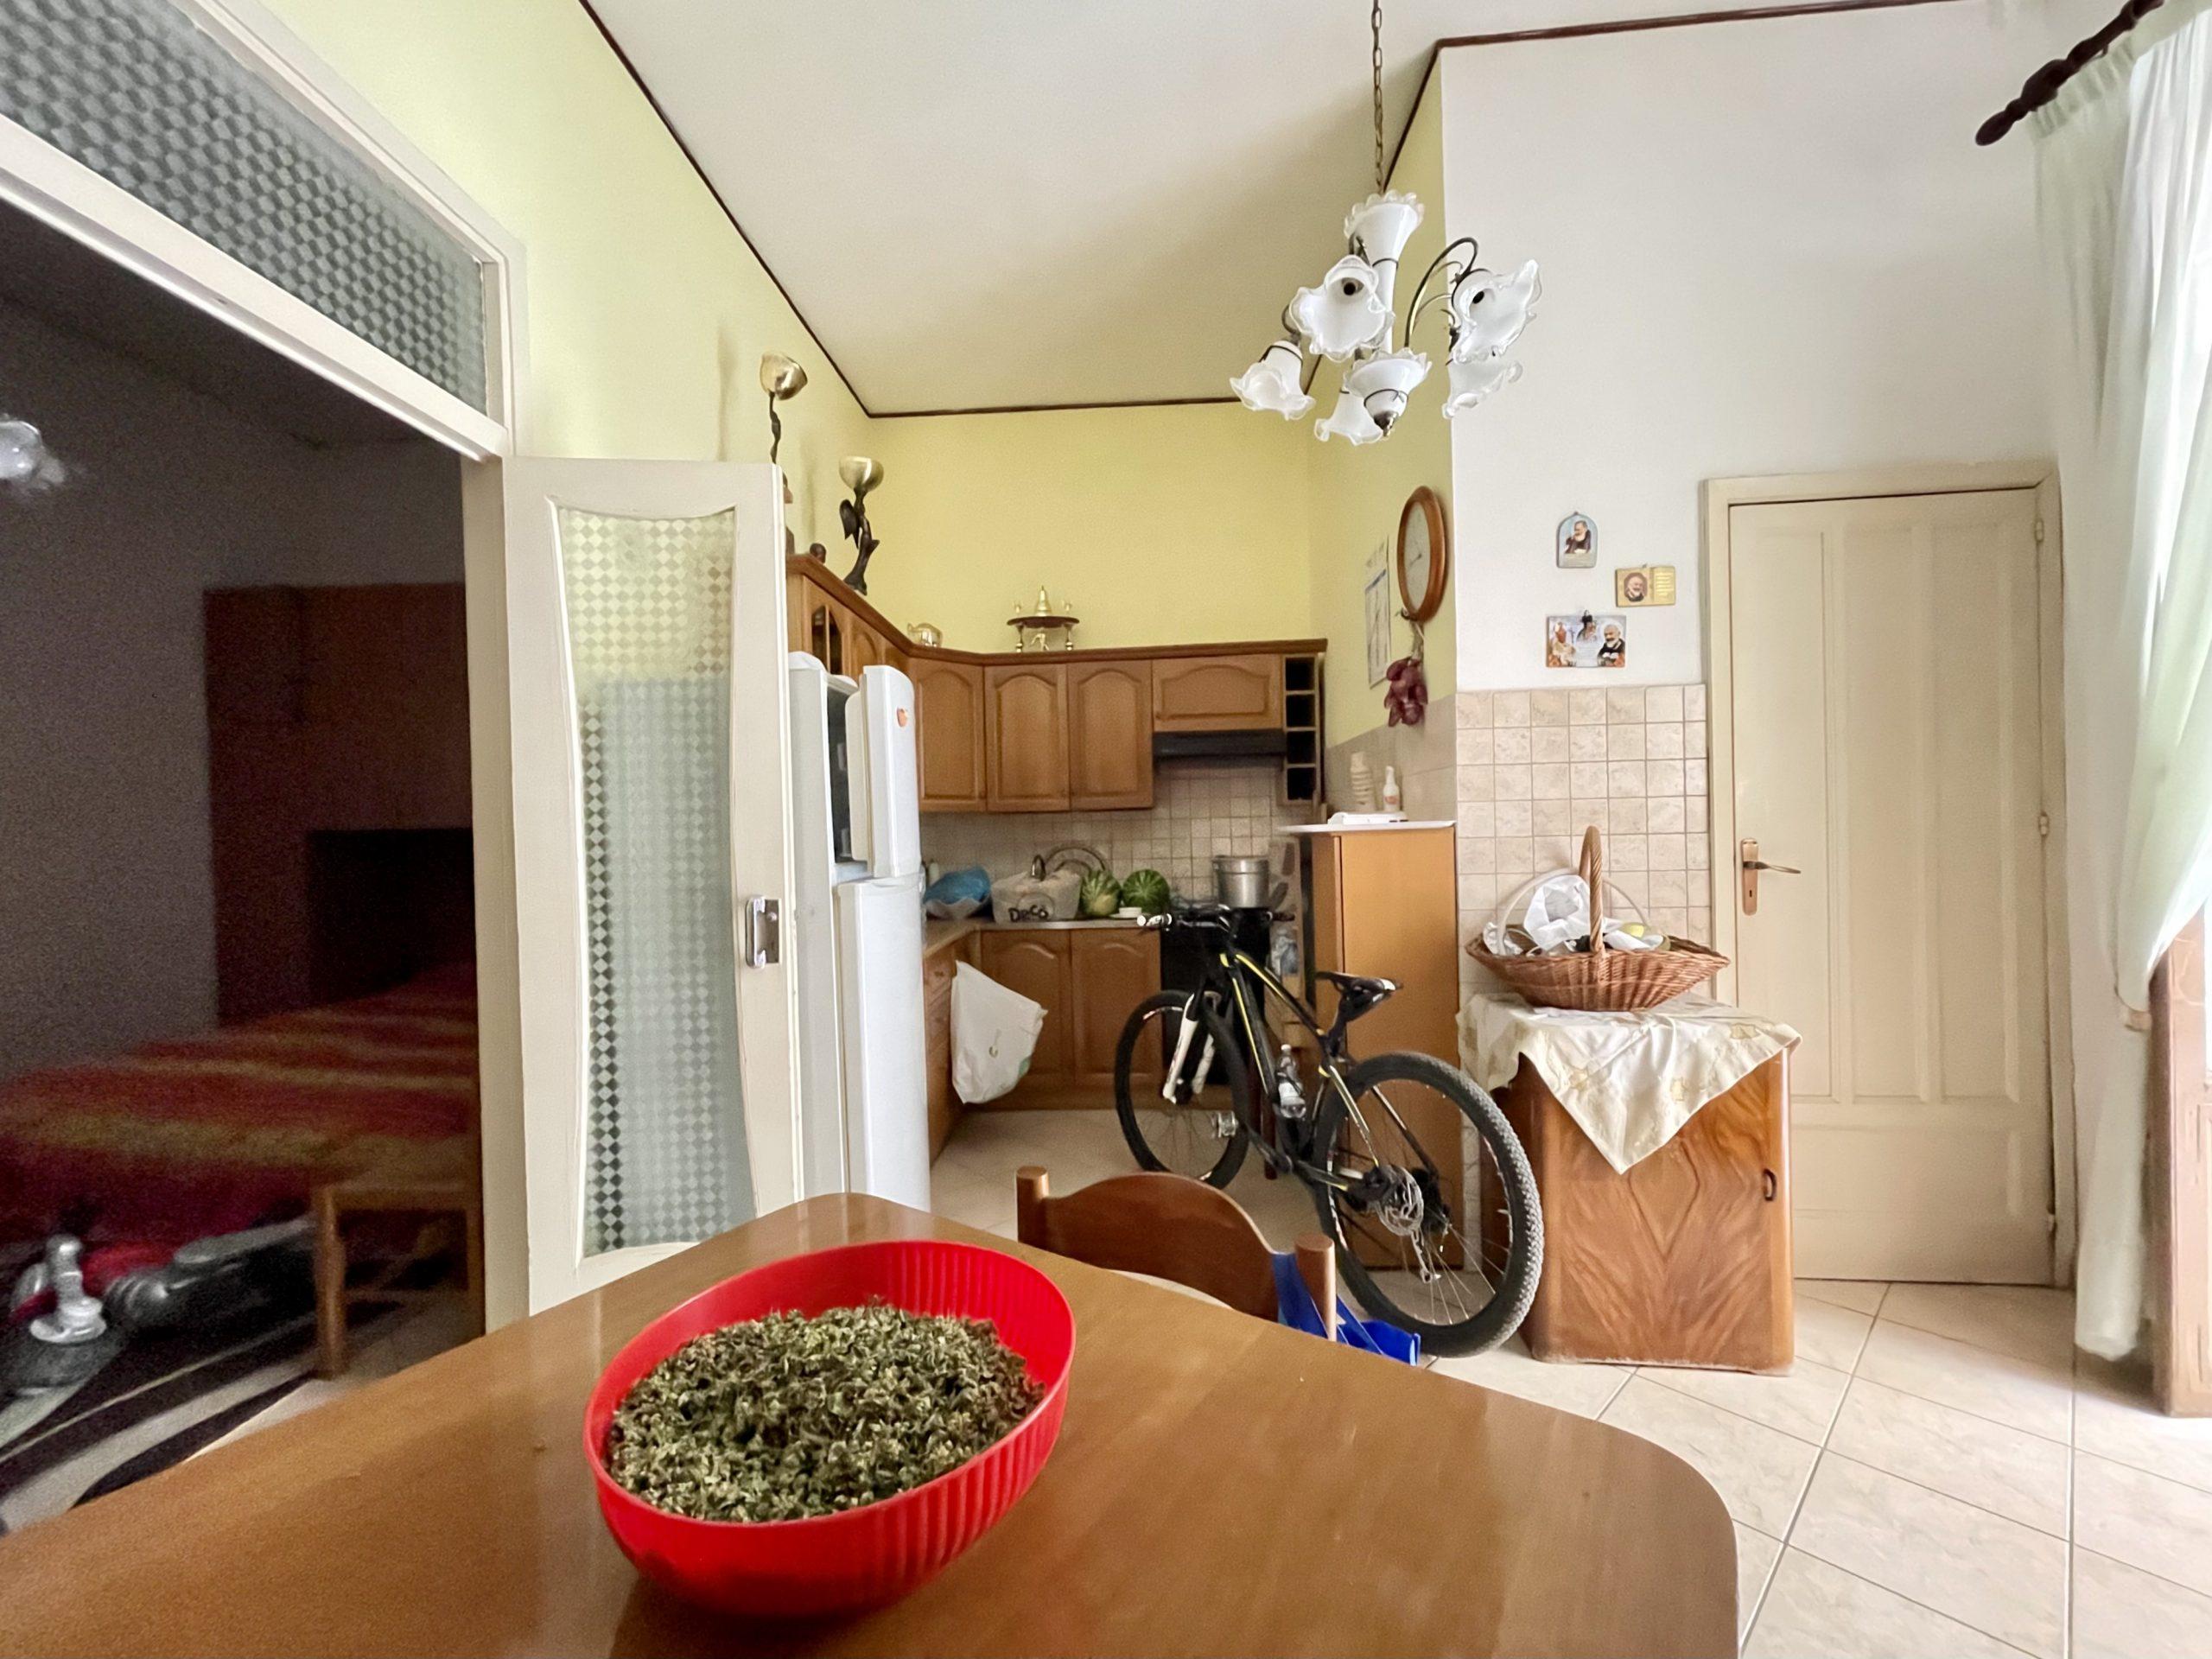 Casa indipendente a Partinico, Via Ricciardi